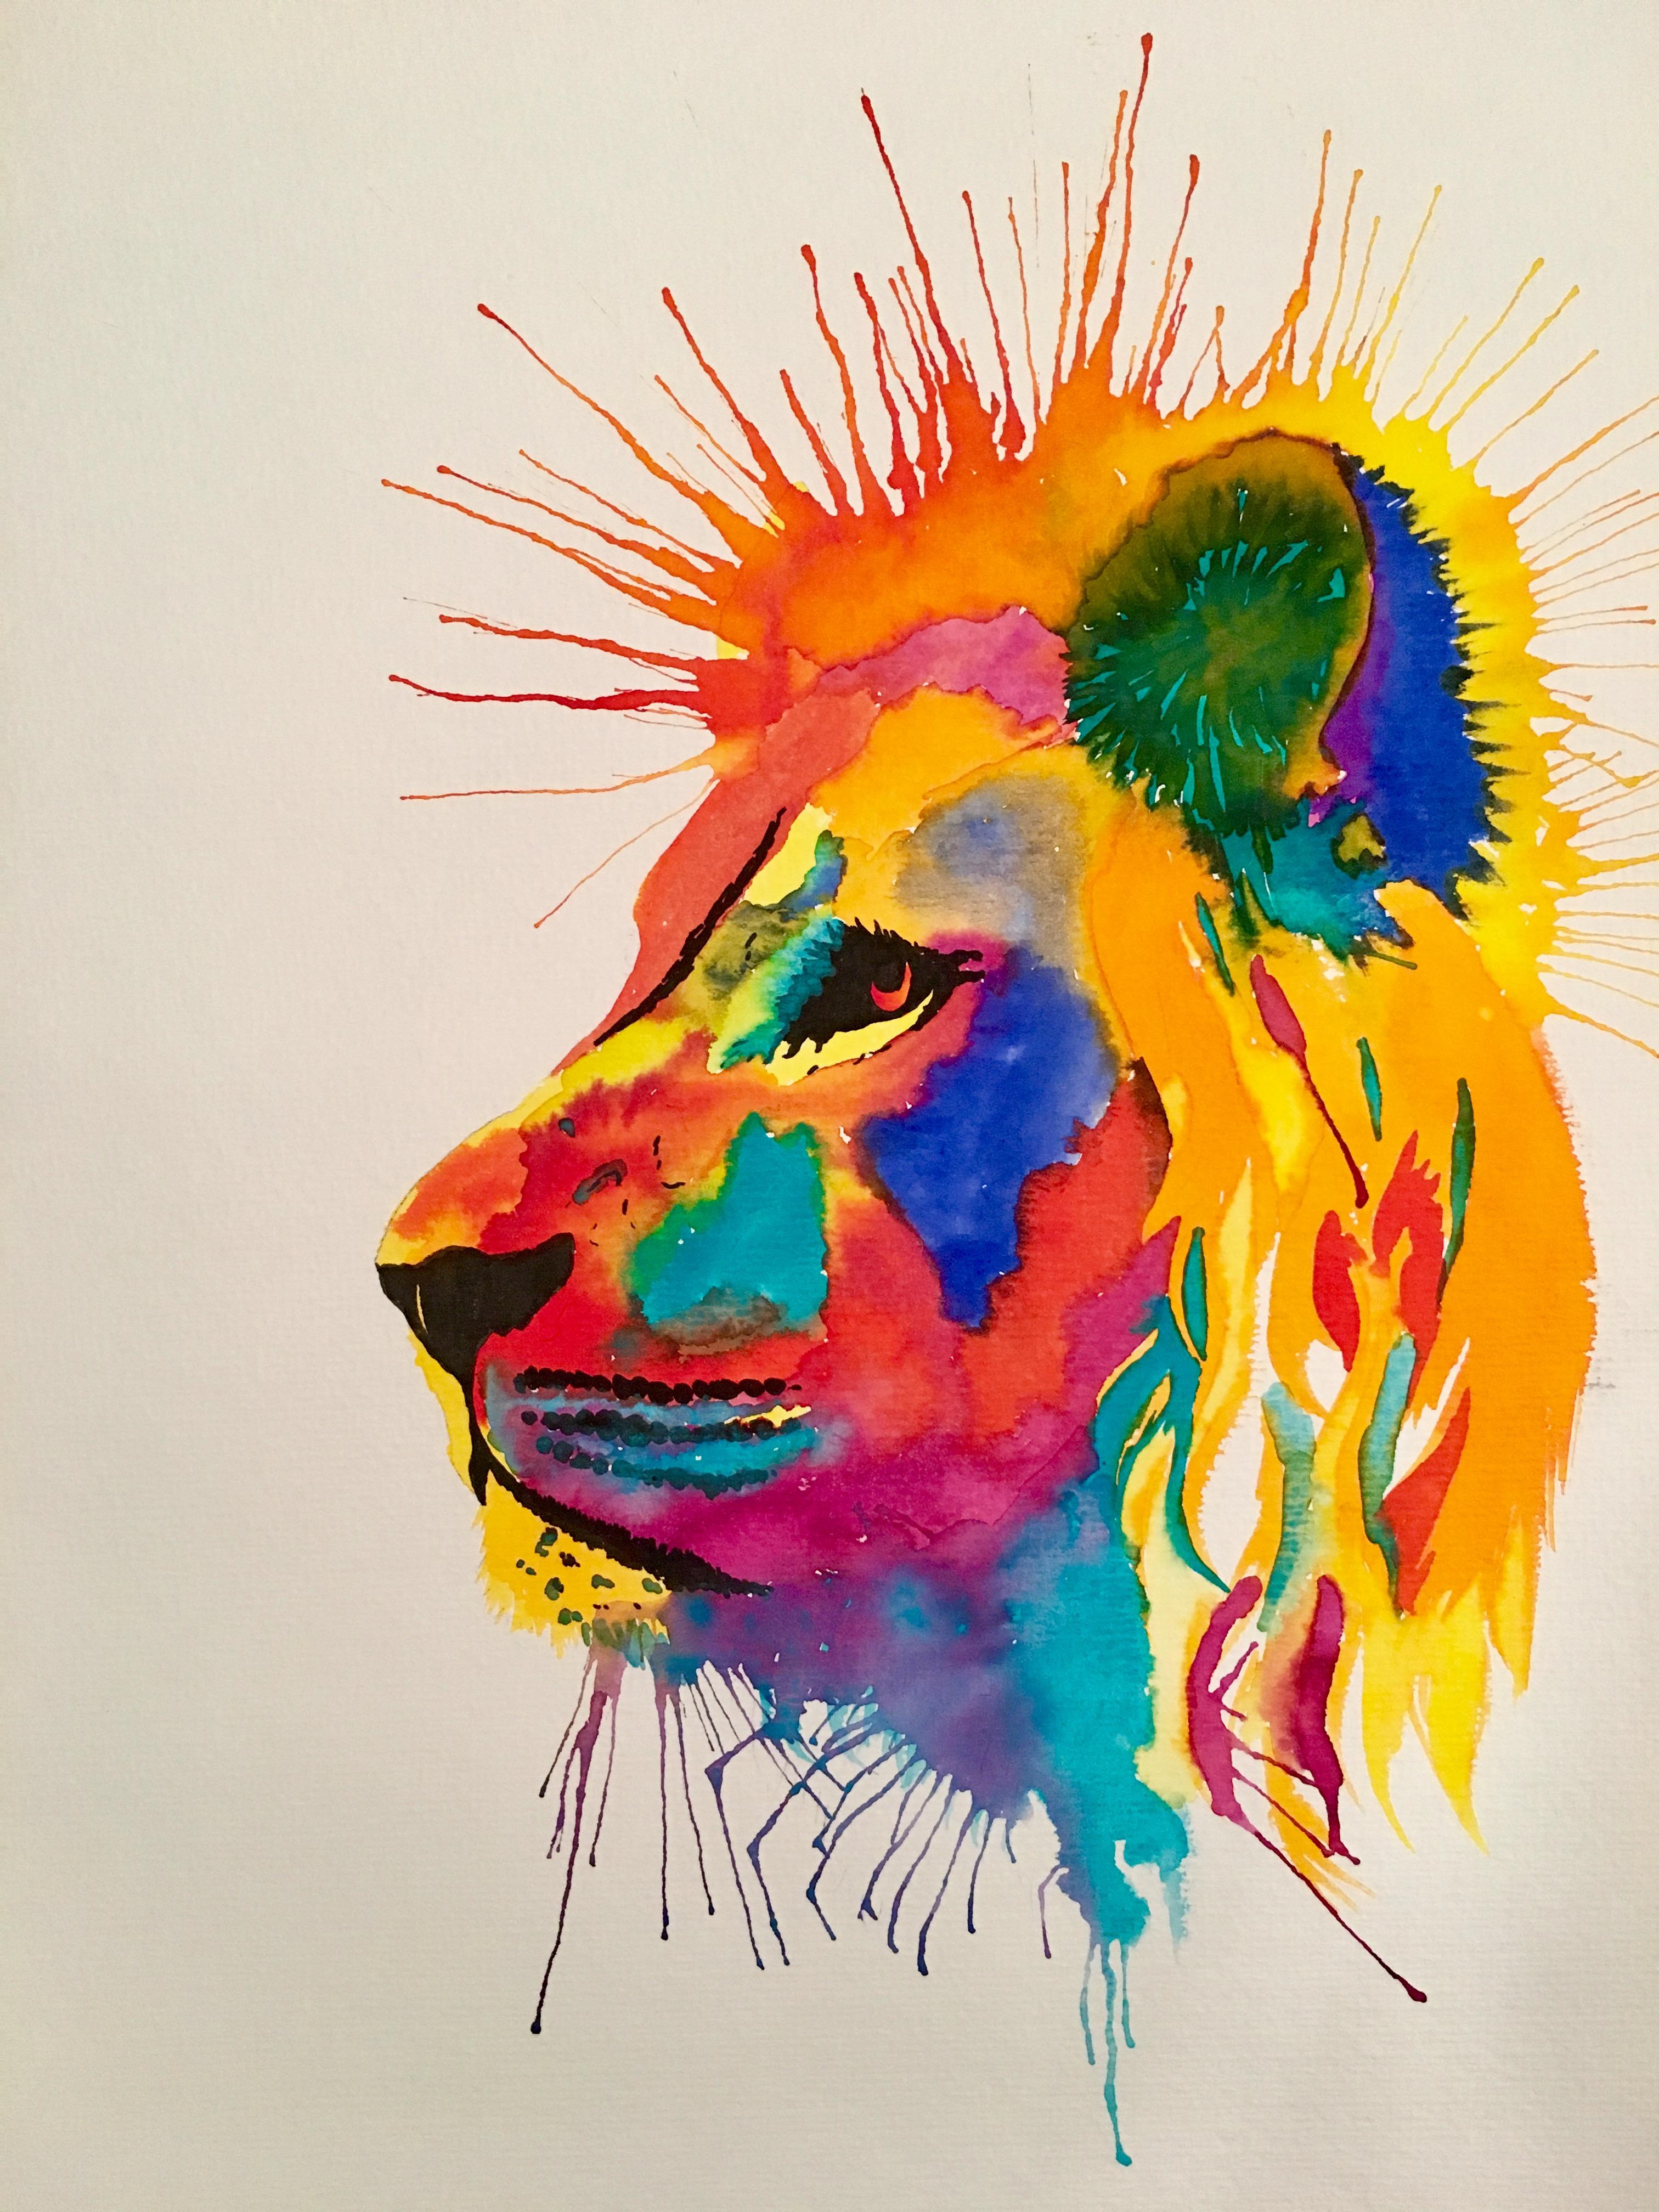 The lion, symbol of Gryffindor House